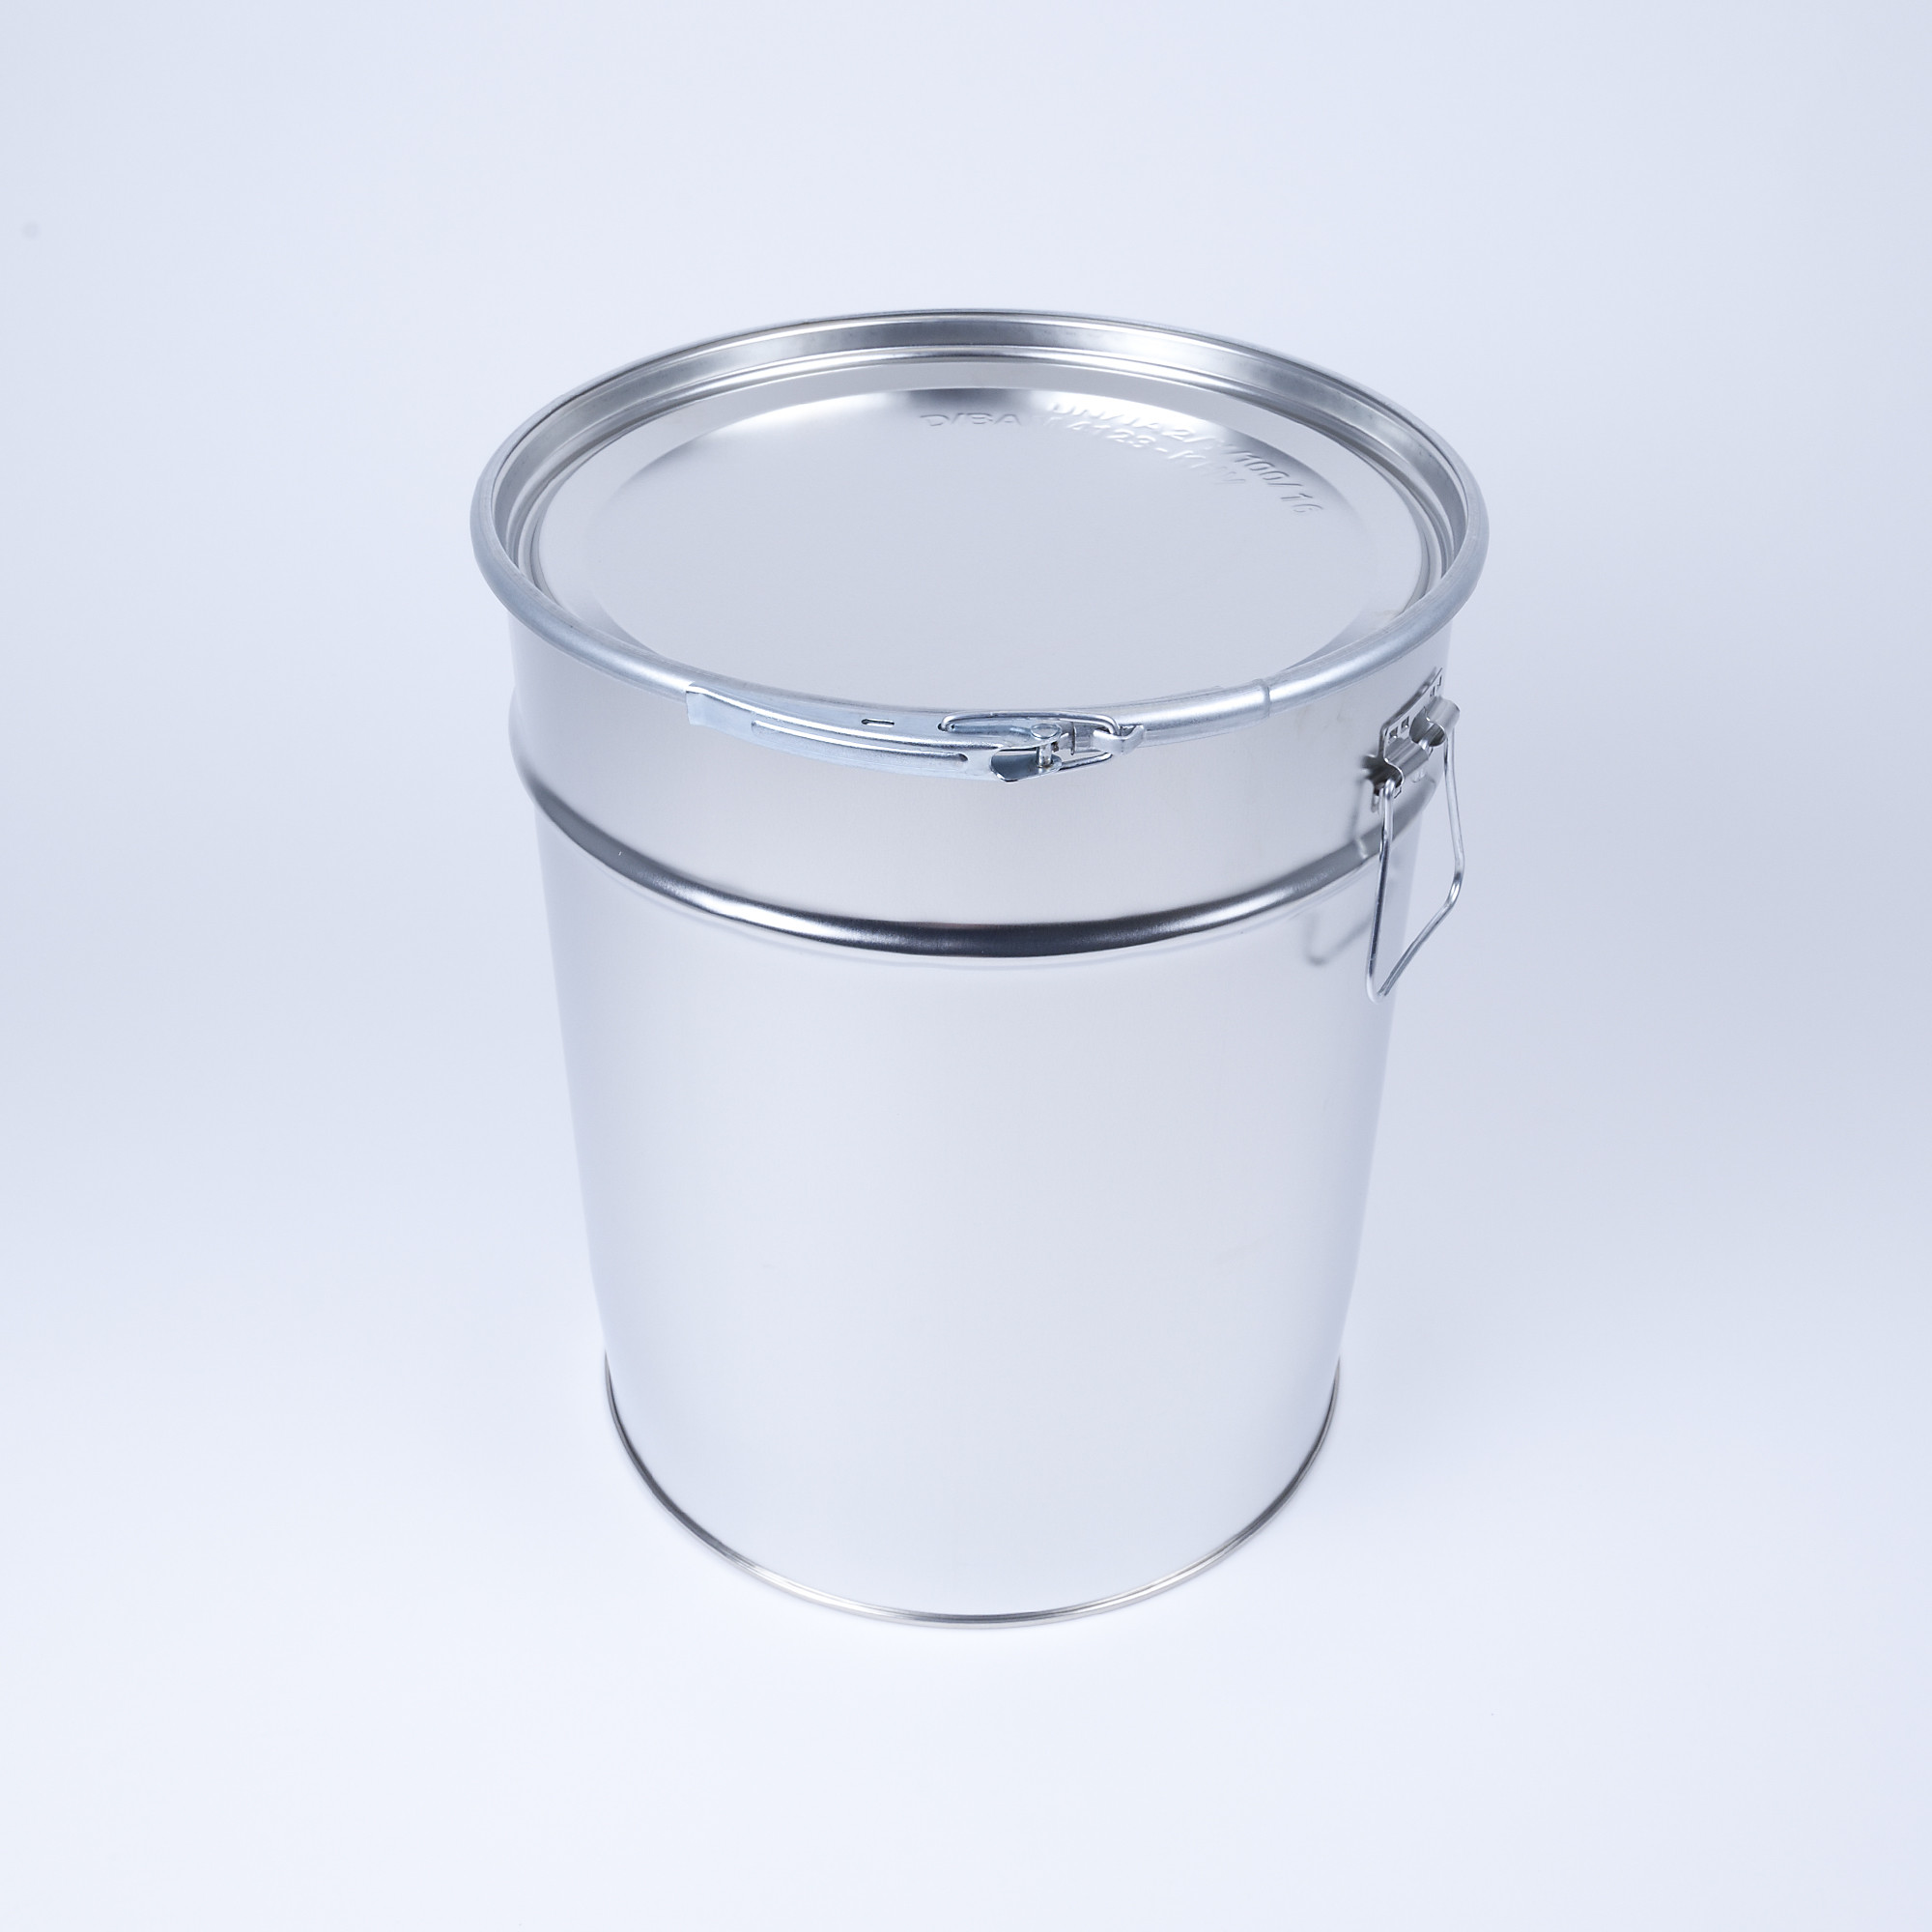 Hobbock 30 Liter, UN, innen schutzlackiert